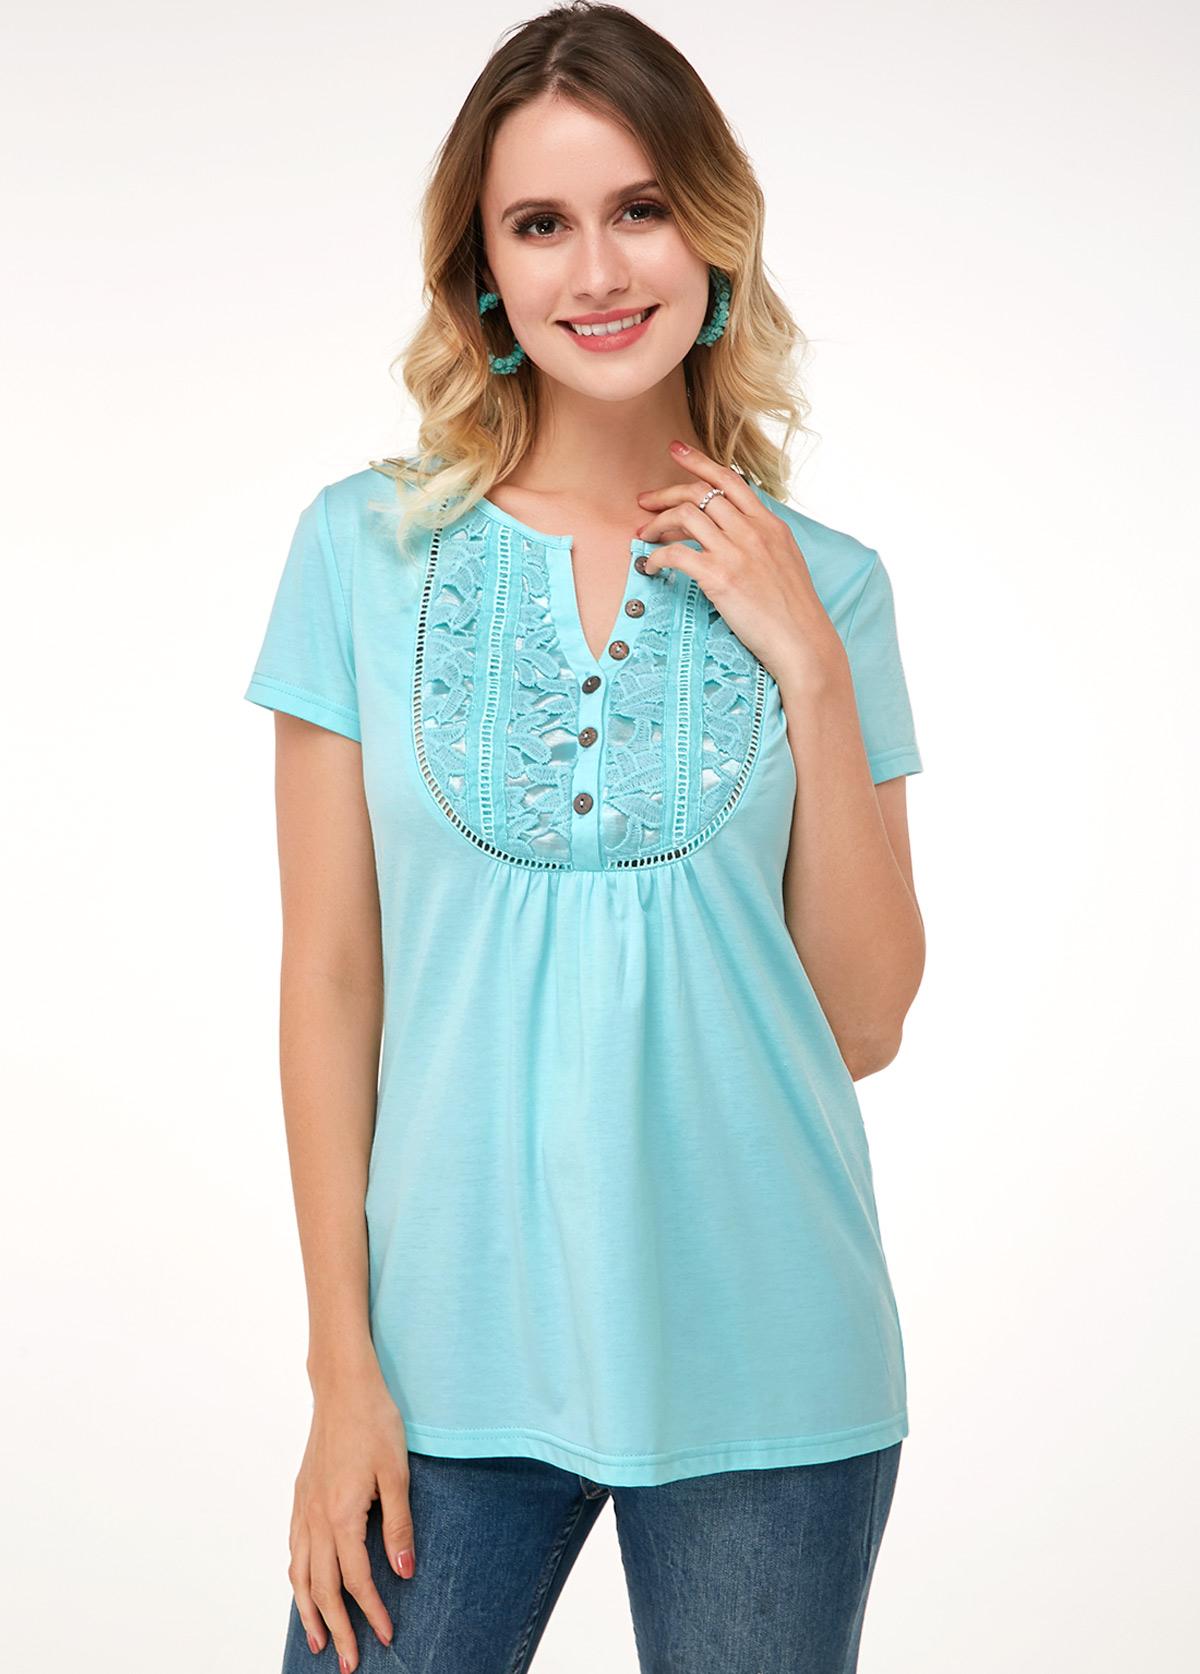 ROTITA Mint Green Lace Panel Short Sleeve Soft T Shirt